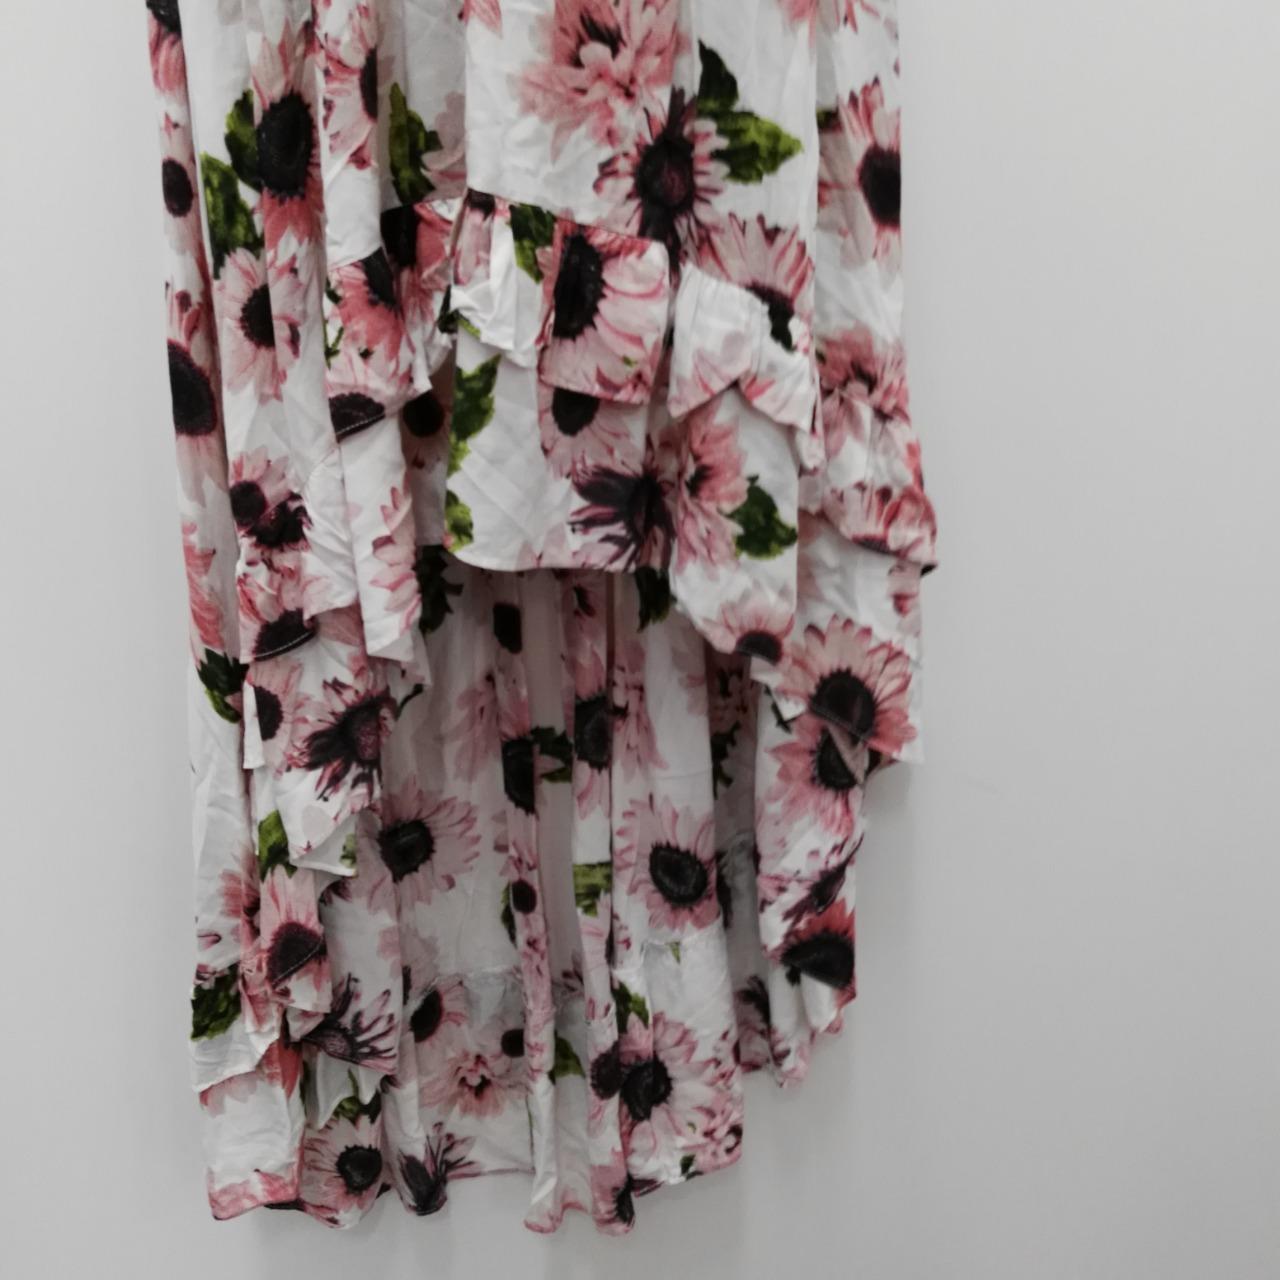 BNWT ANGEL BIBA Summer Dress Womens   Size 8  White/Pink /Green/Purple